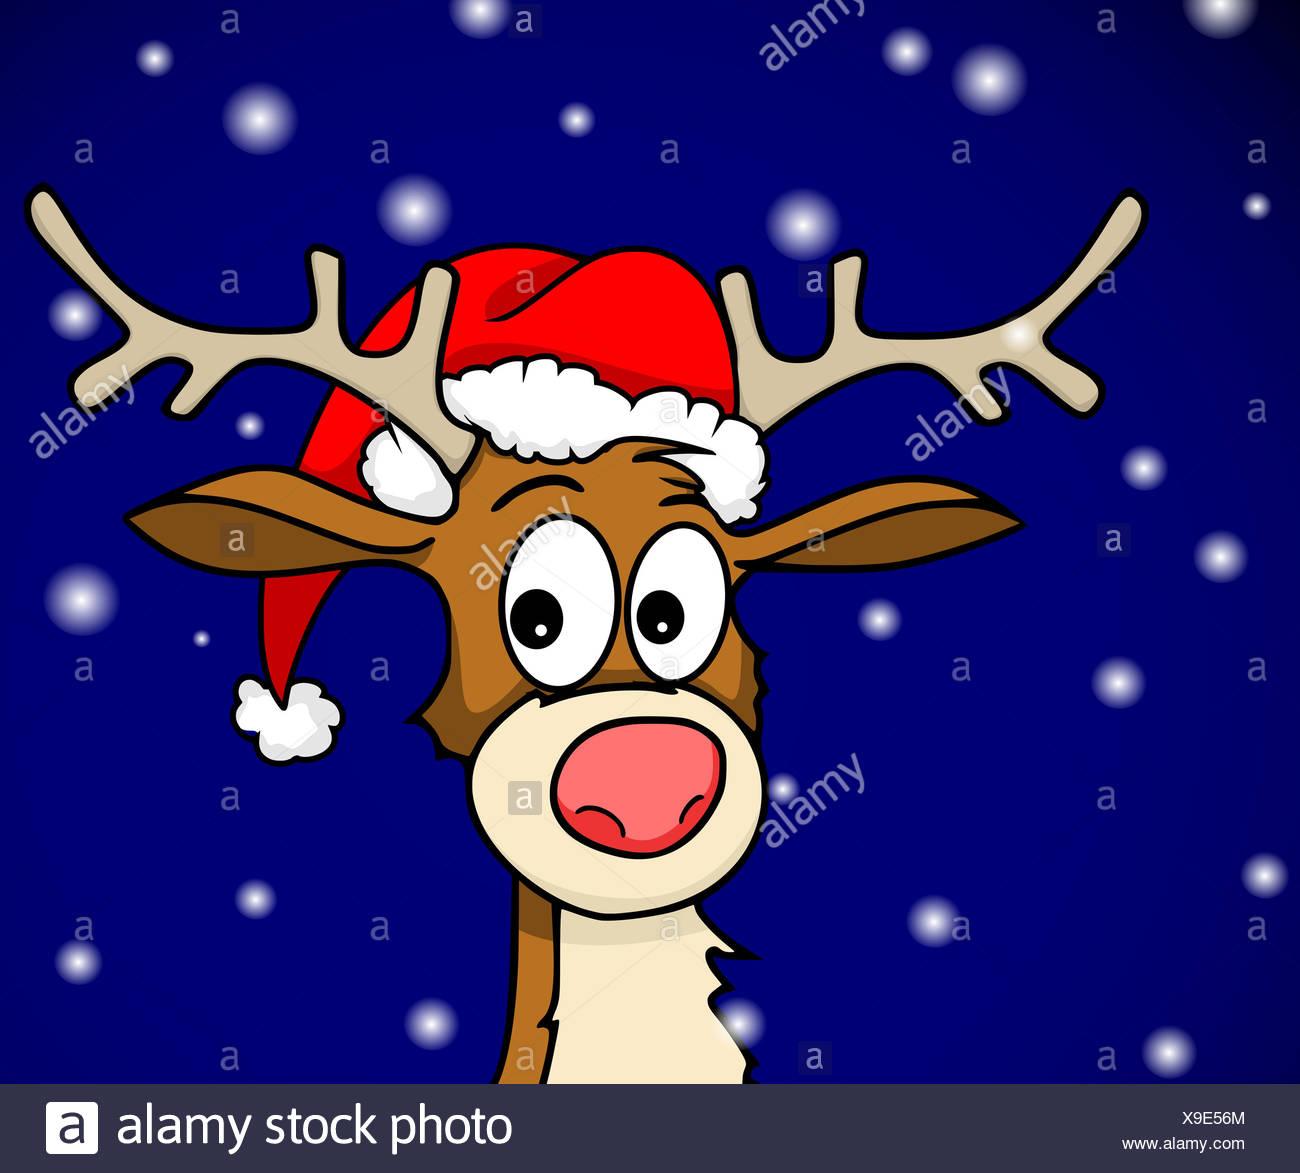 Rudolph Stock Photo